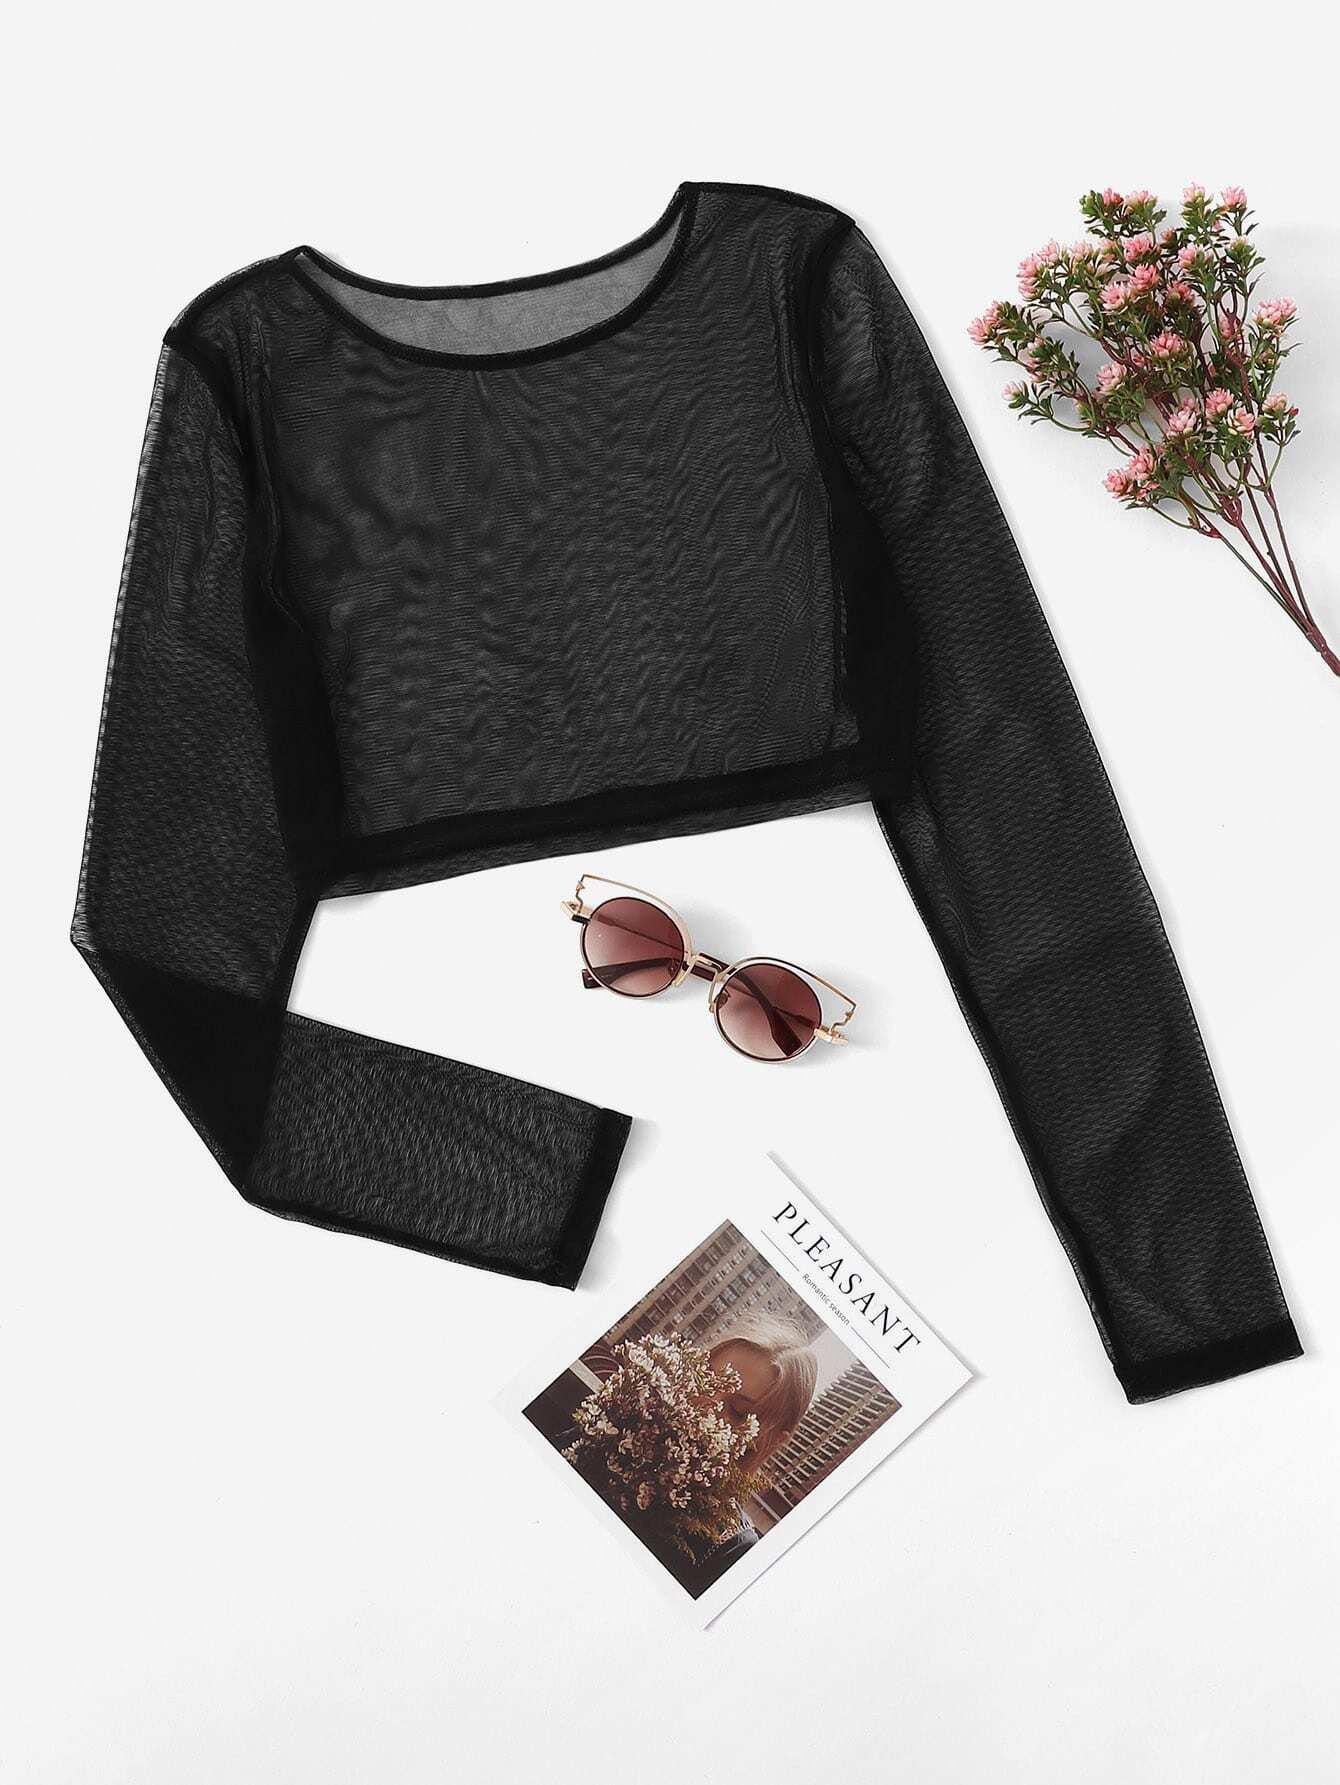 Купить Сетчатая прозначная блузка, null, SheIn